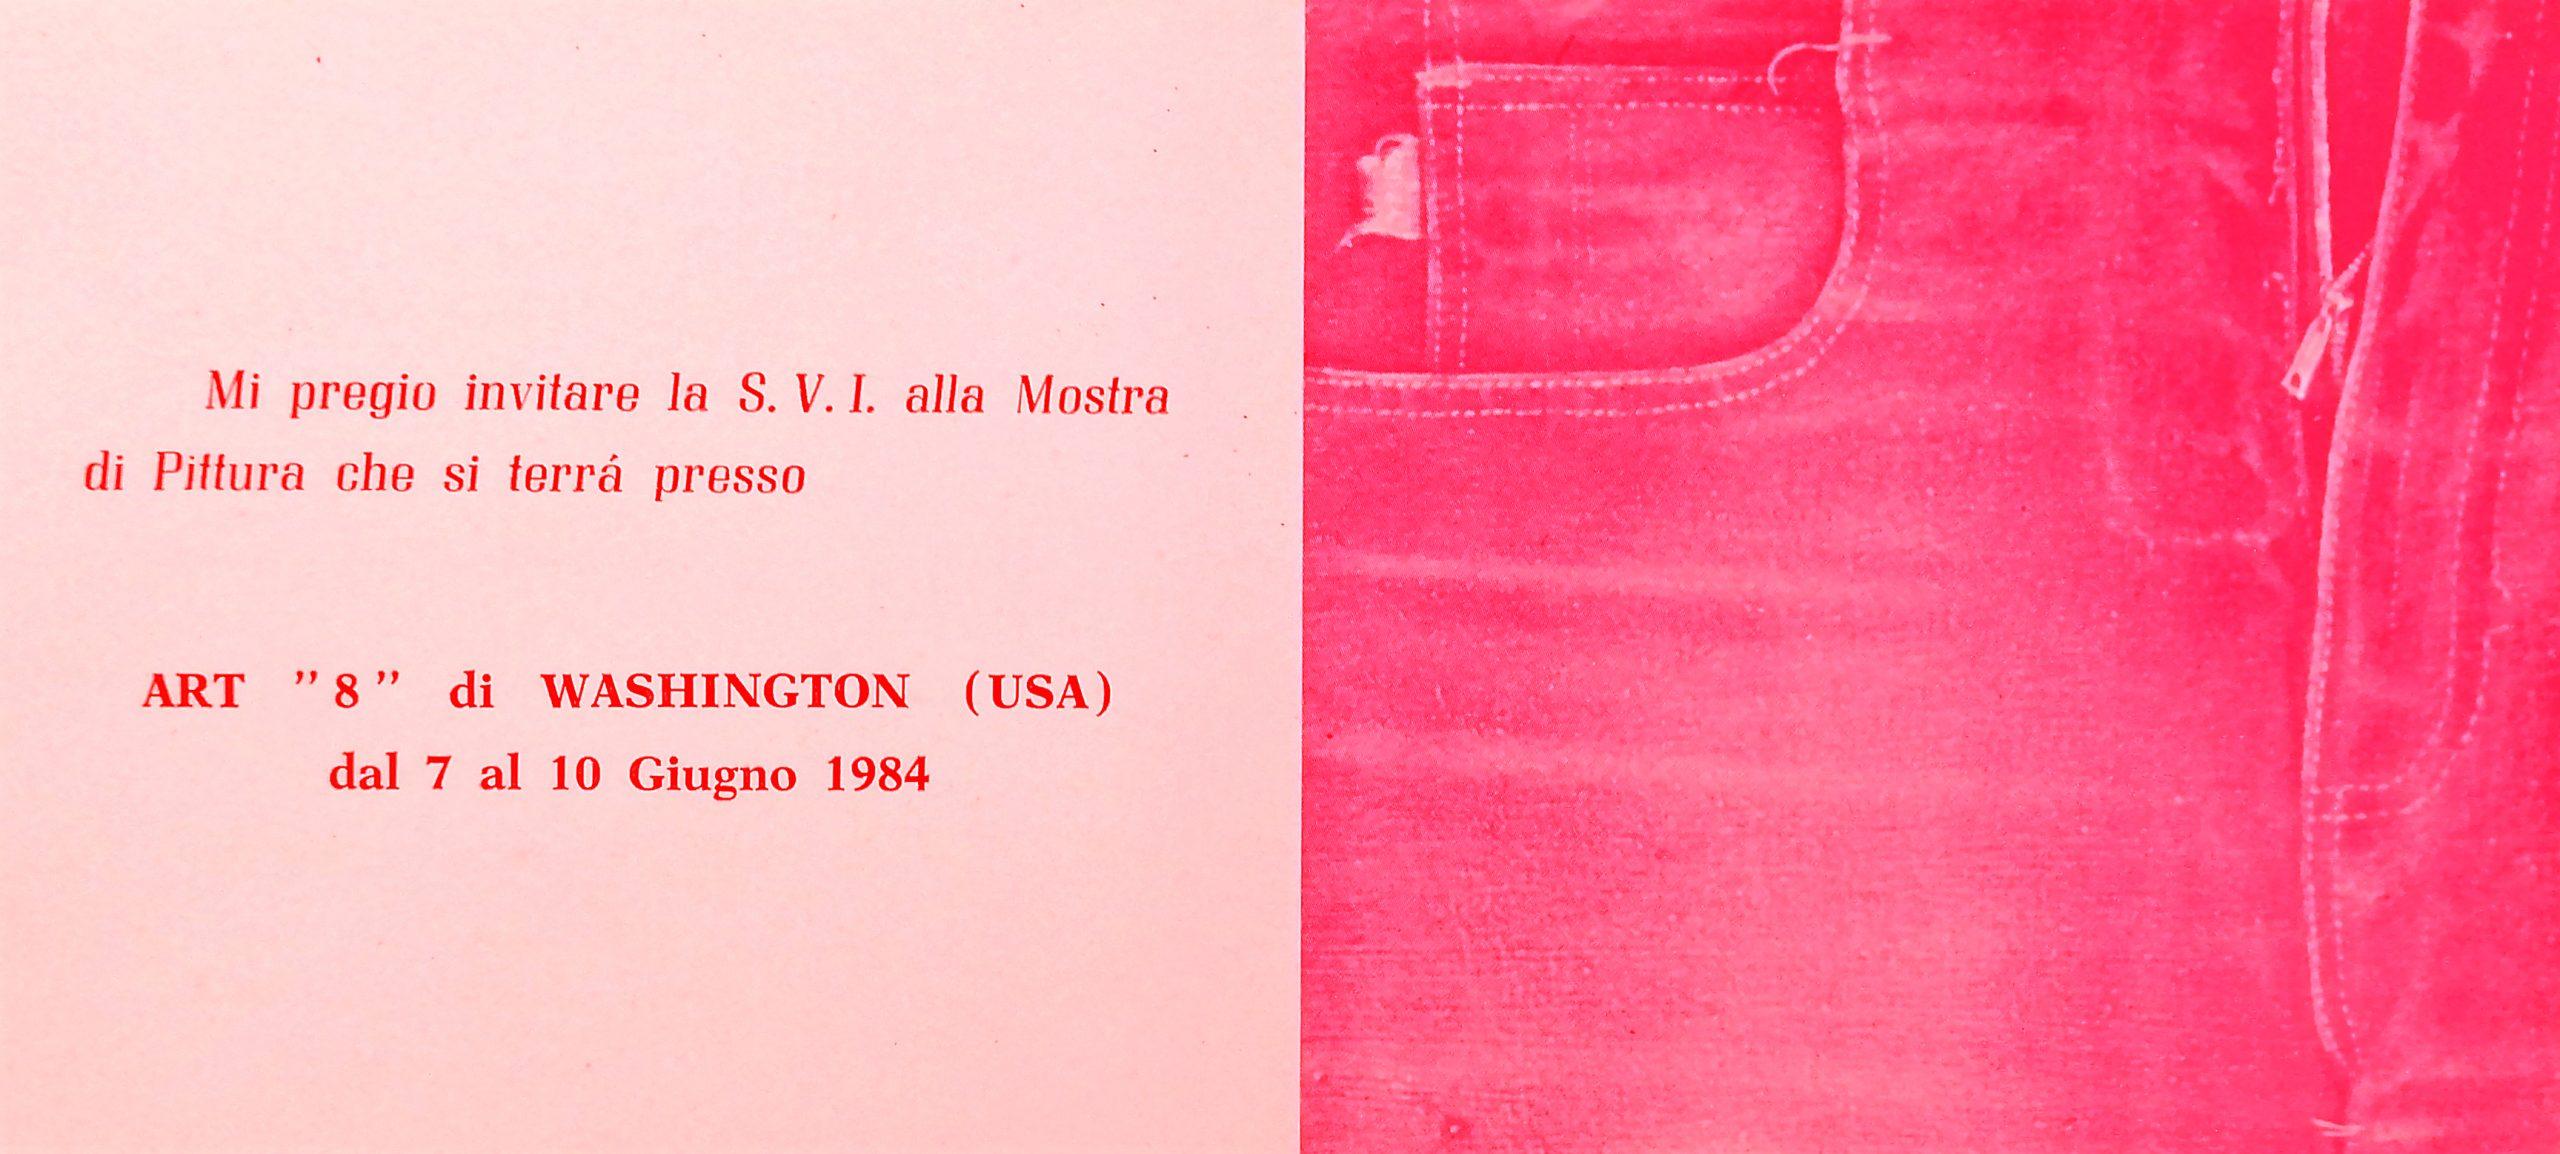 1984 ART 8 Washington USA scaled - Bibliography/ Catalogues